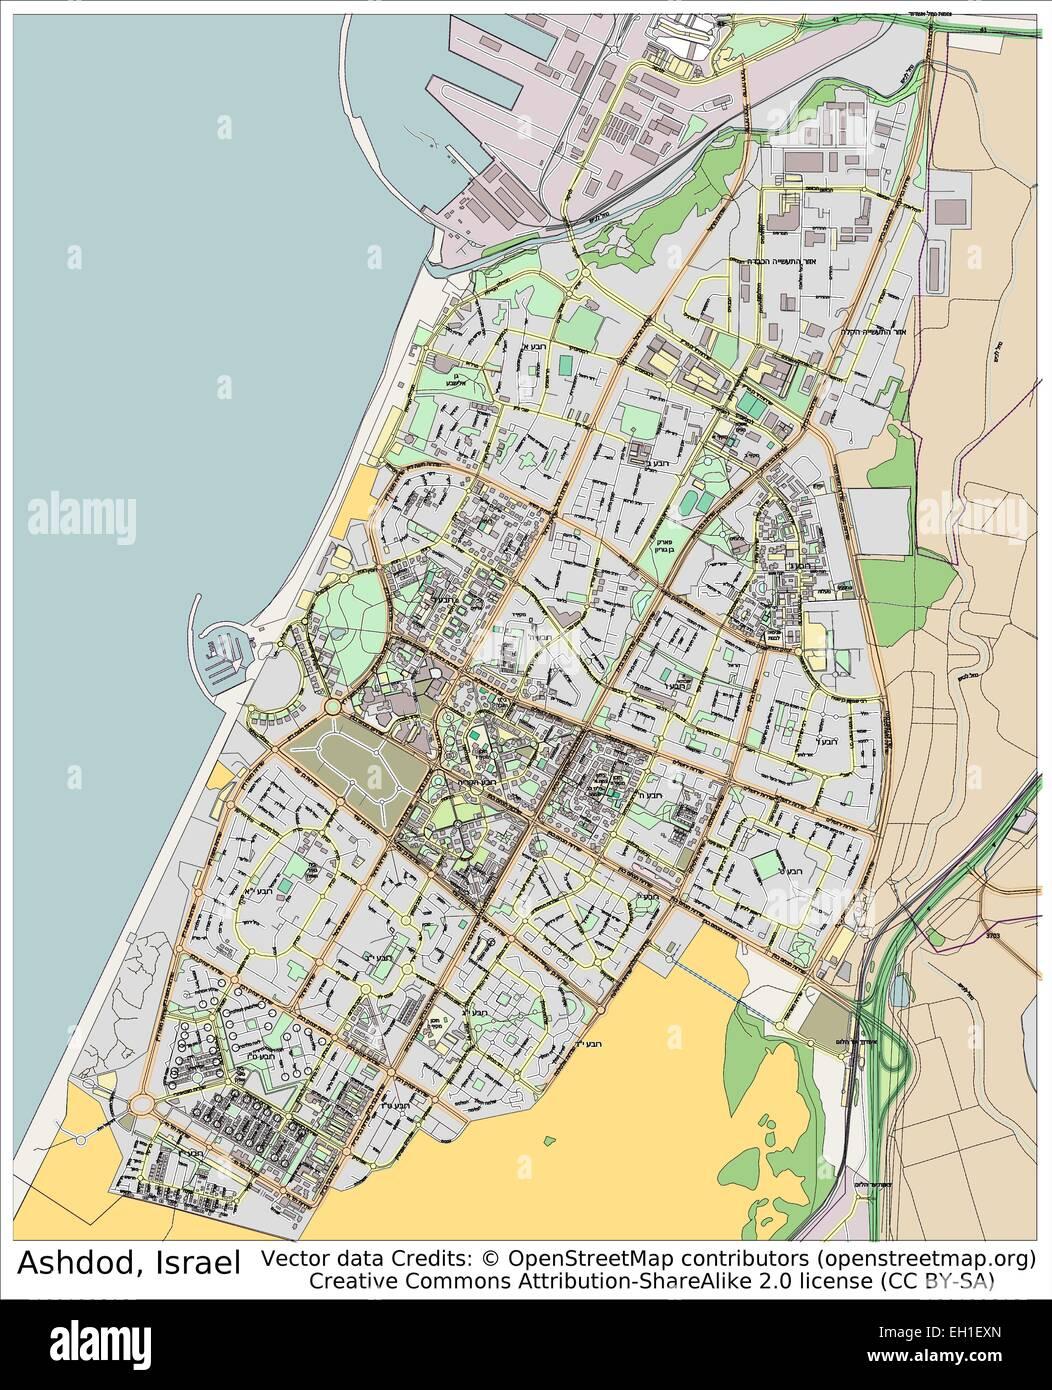 Ashdod Israel city map Stock Vector Art Illustration Vector Image